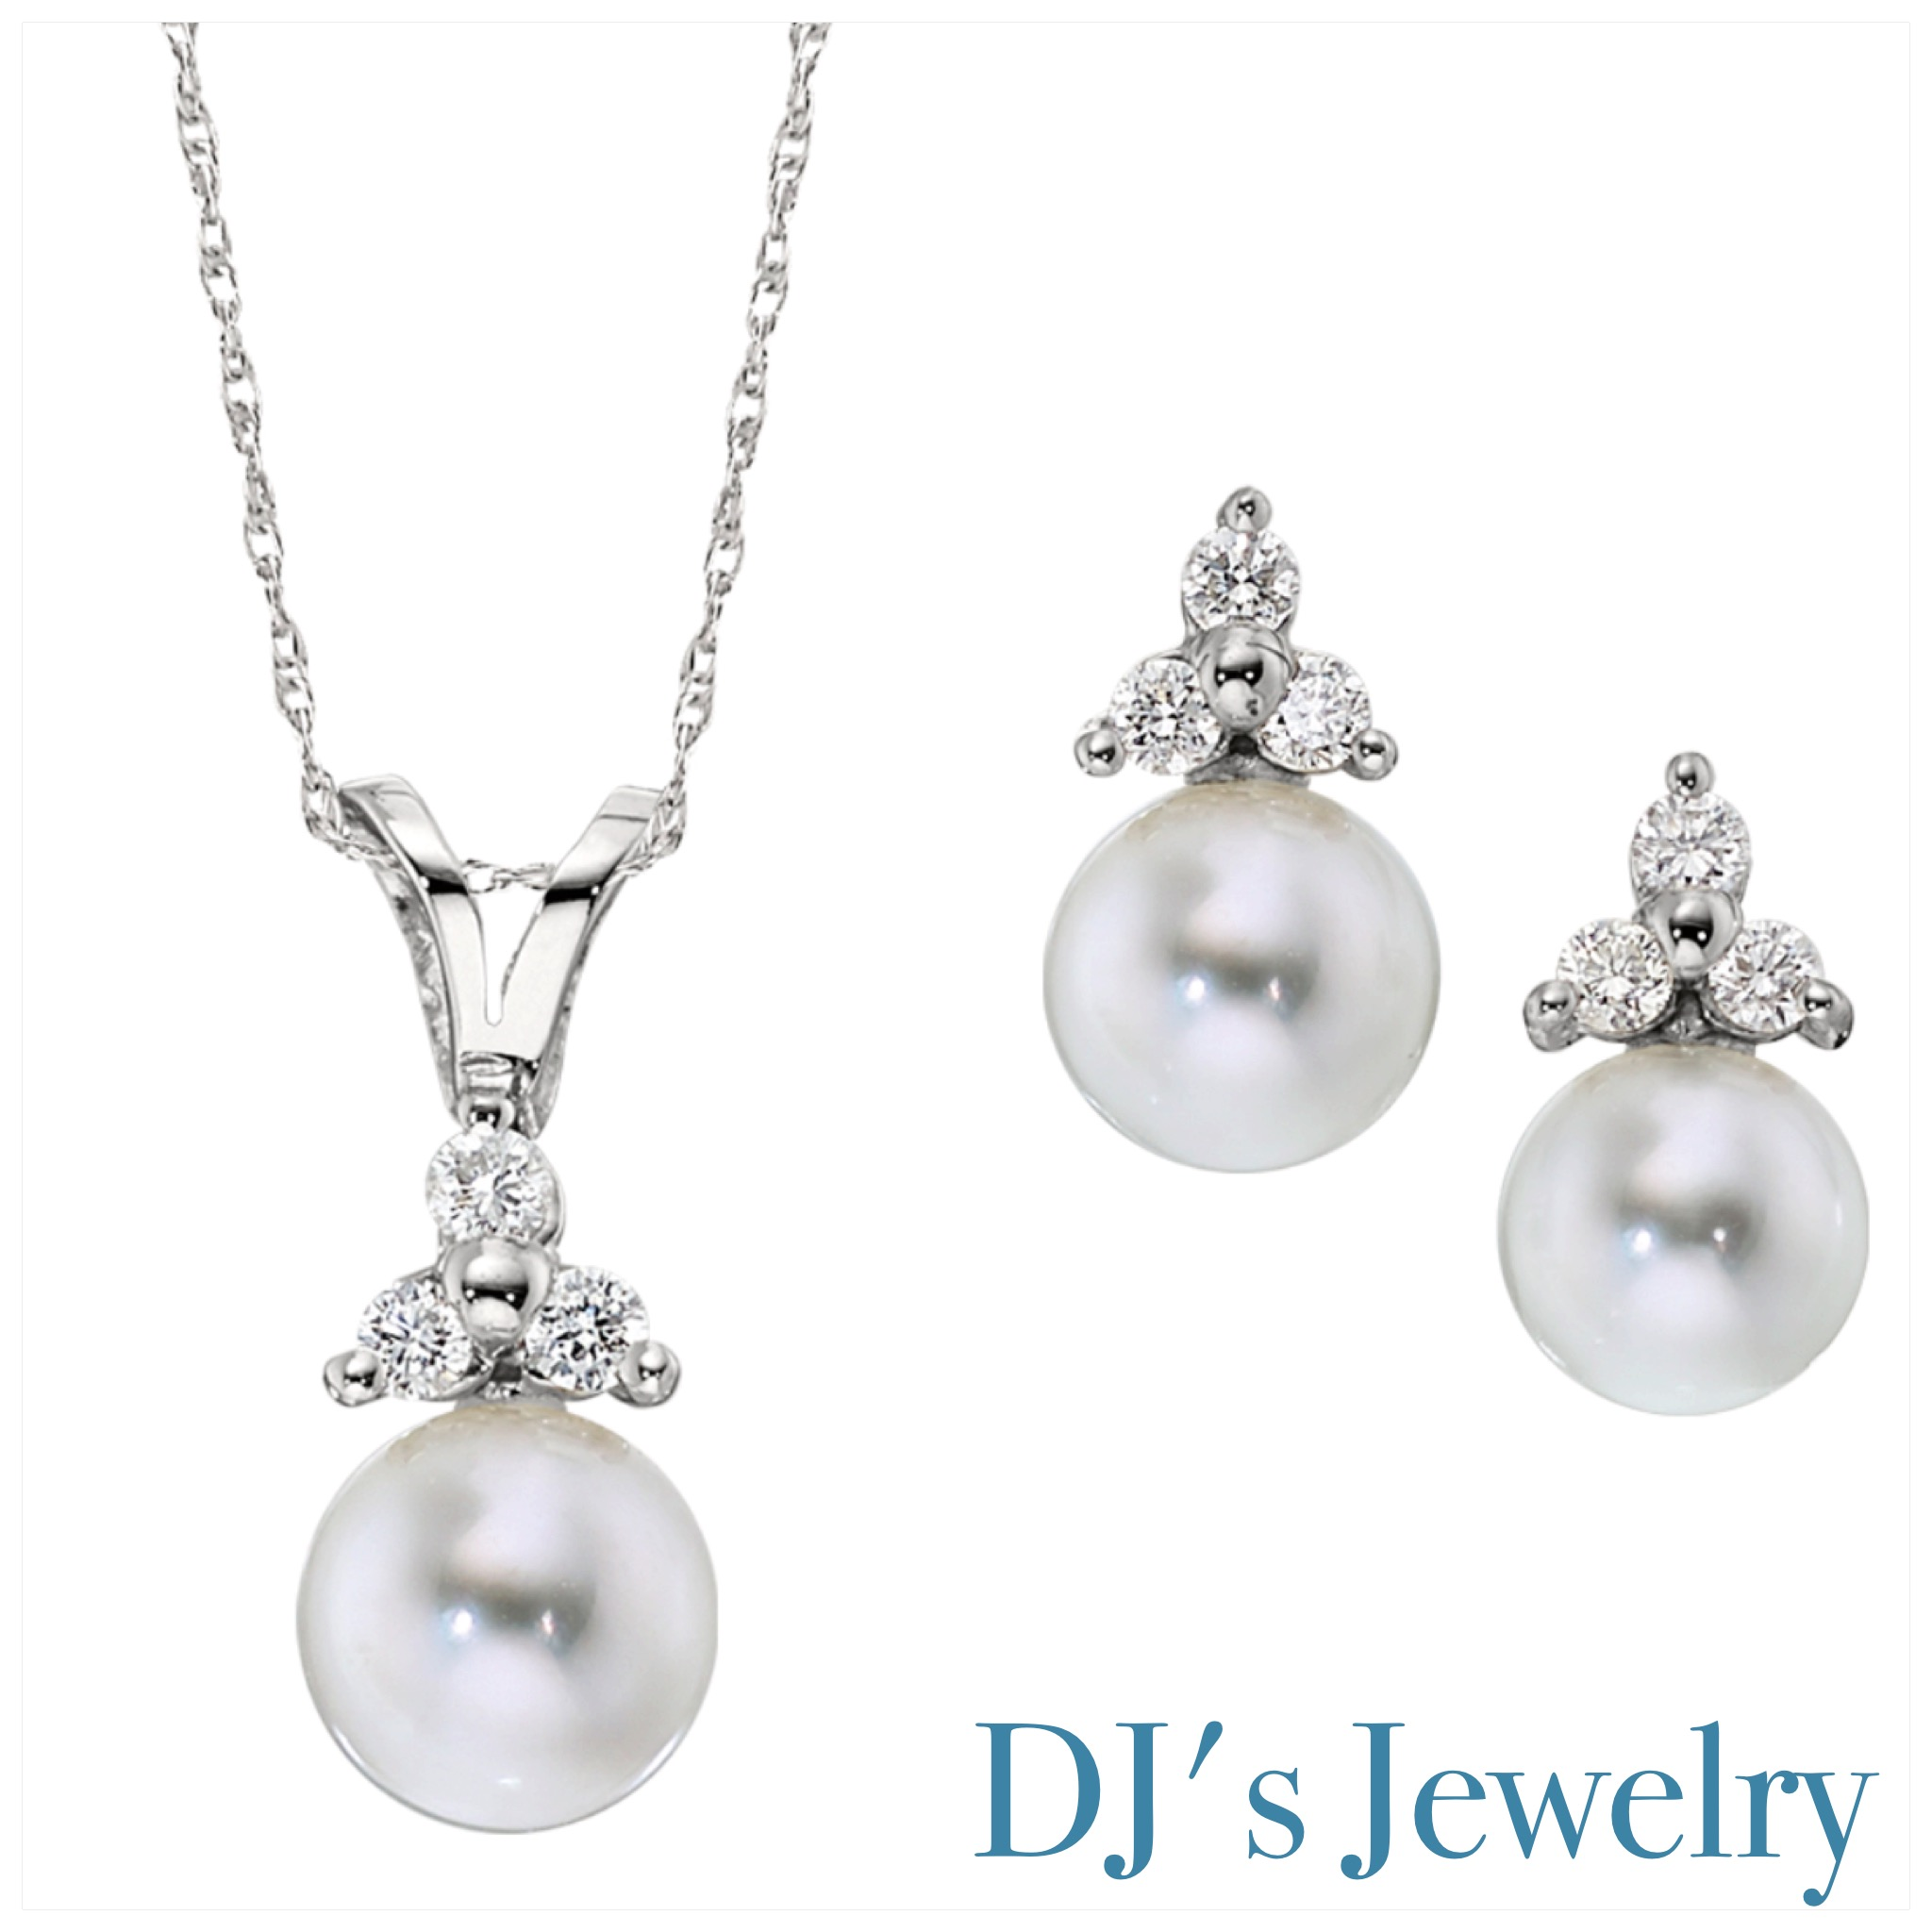 jewelry brand names that start with s style guru